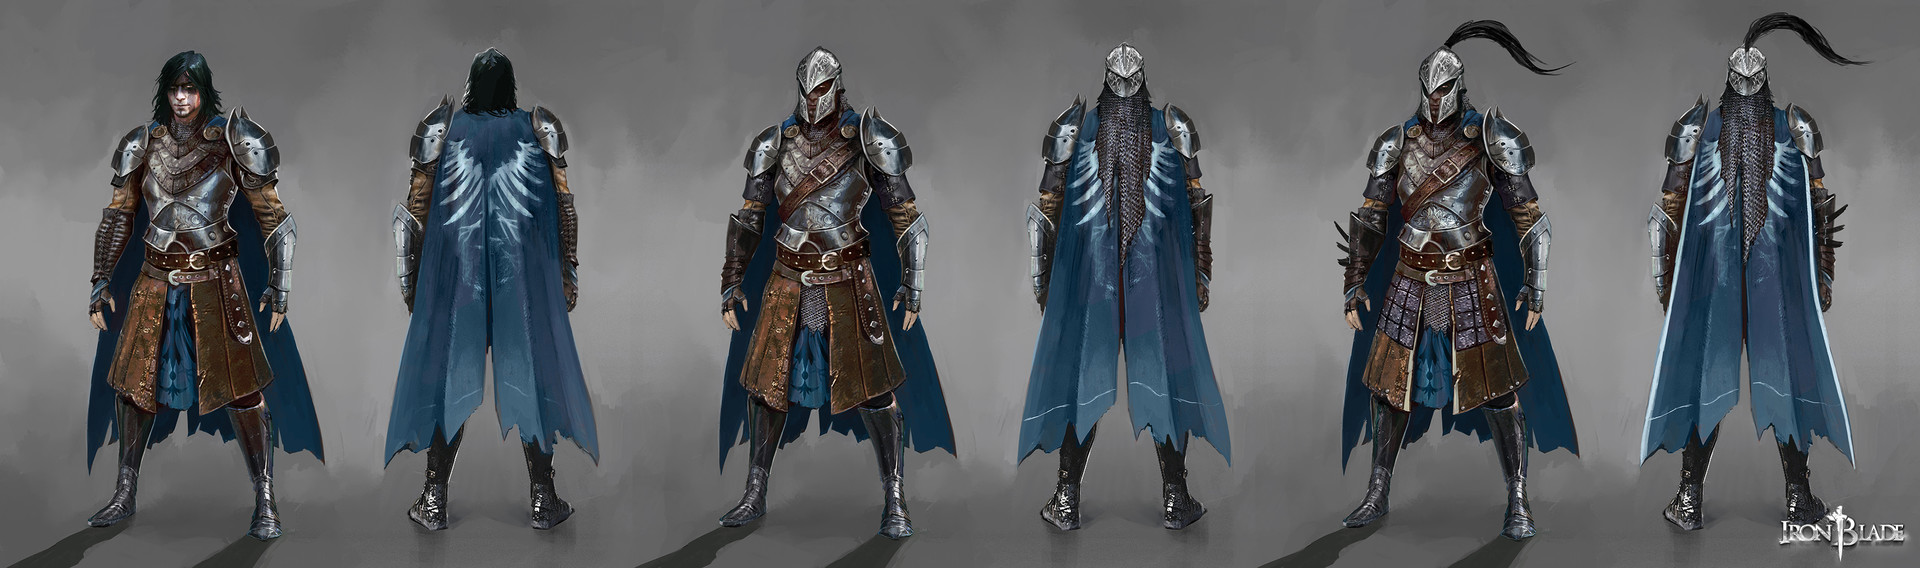 Alexandre chaudret hf armorset armors04